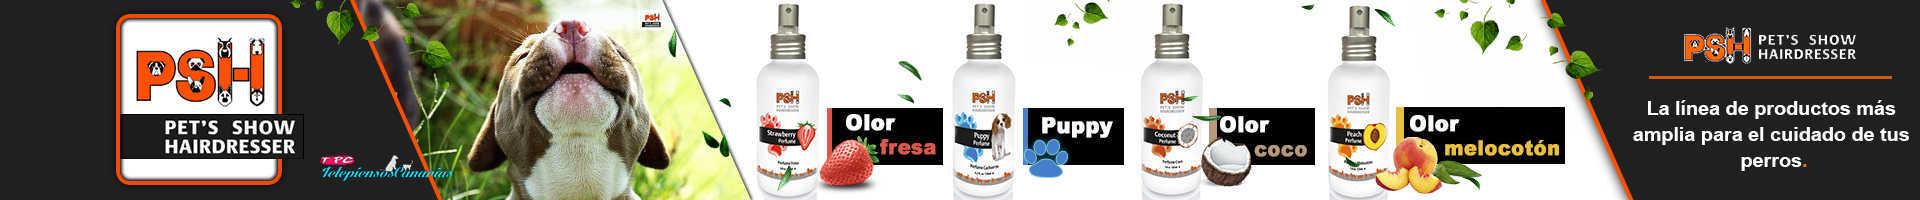 Perfumes perros PSH TelepiensosCanarias